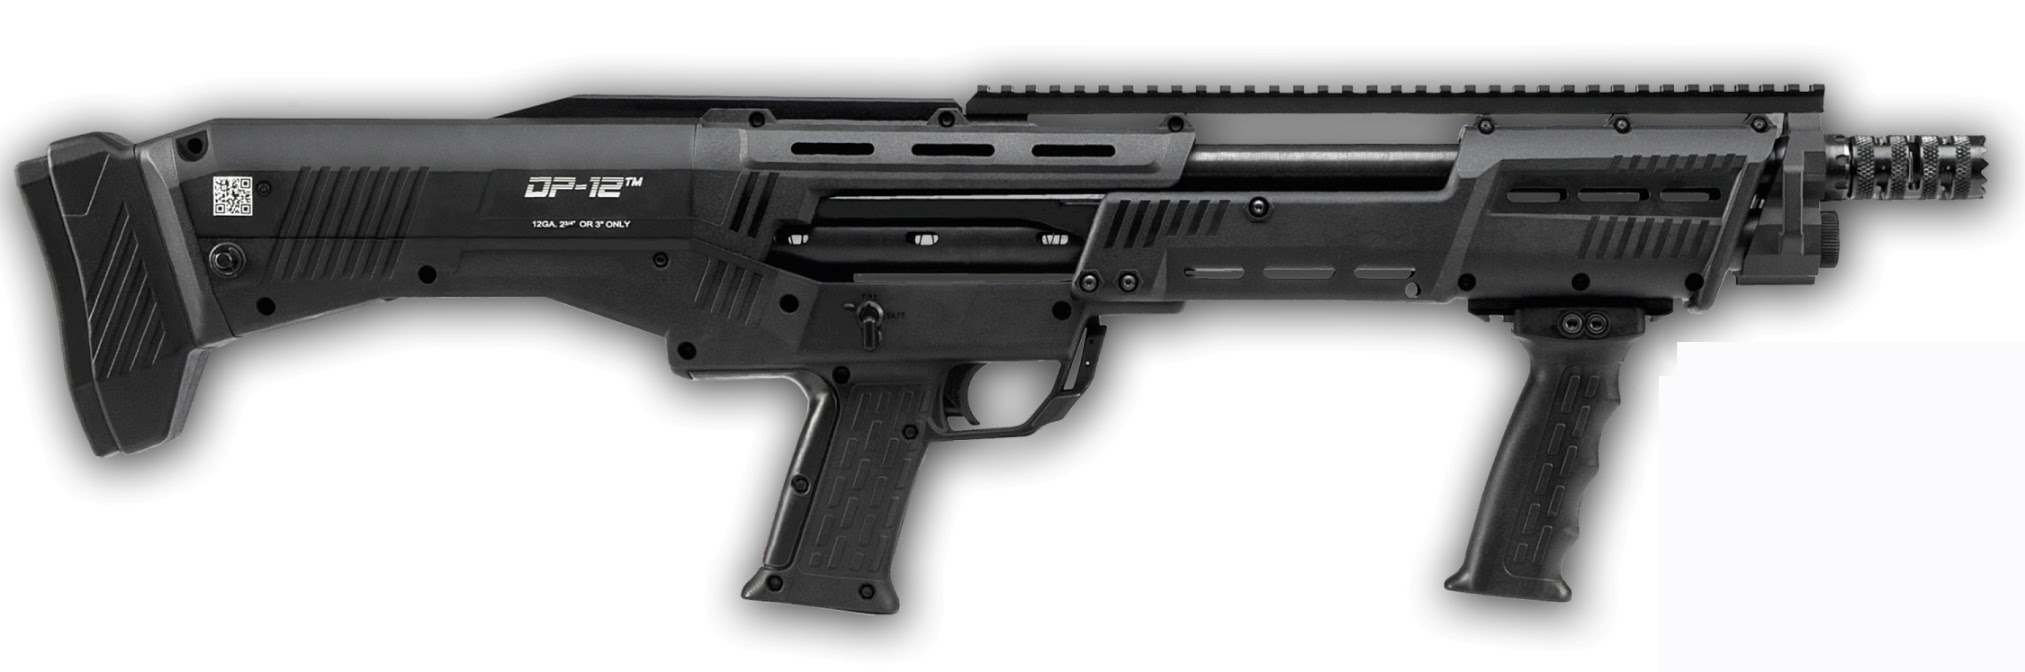 Cheaper Than Dirt Gift Guide A Marvel Of Engineering Dp 12 Shotgun